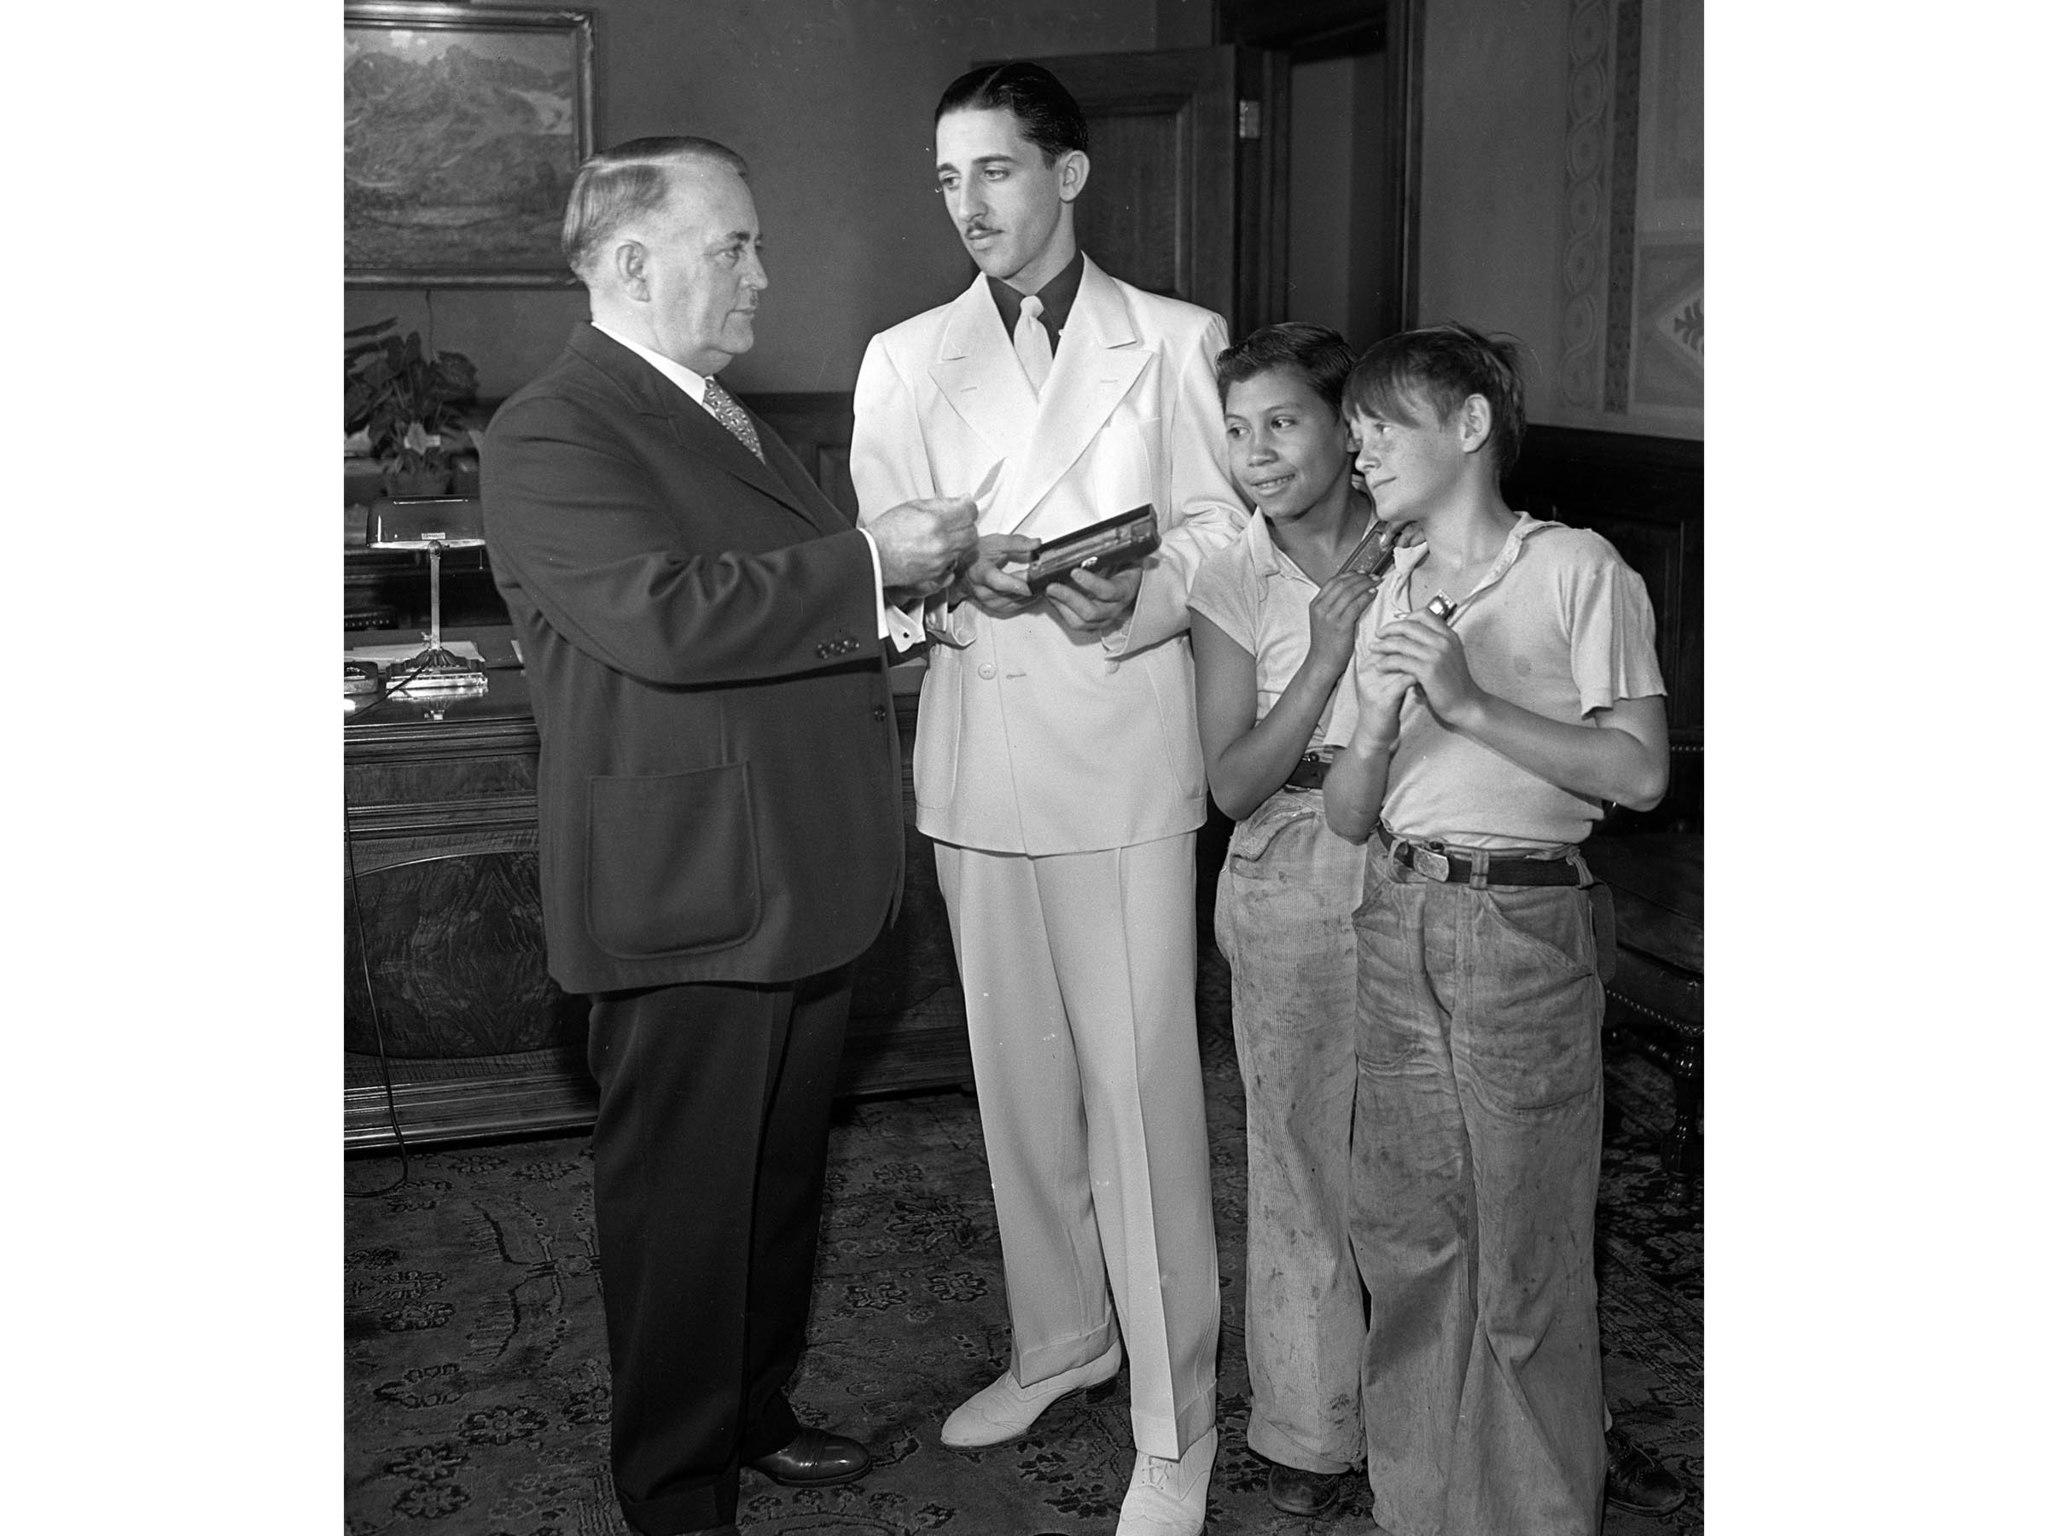 June 27, 1935: From left, Mayor Frank Shaw, Harmonica teacher Kenneth Milton, Manuel Martinez, and H